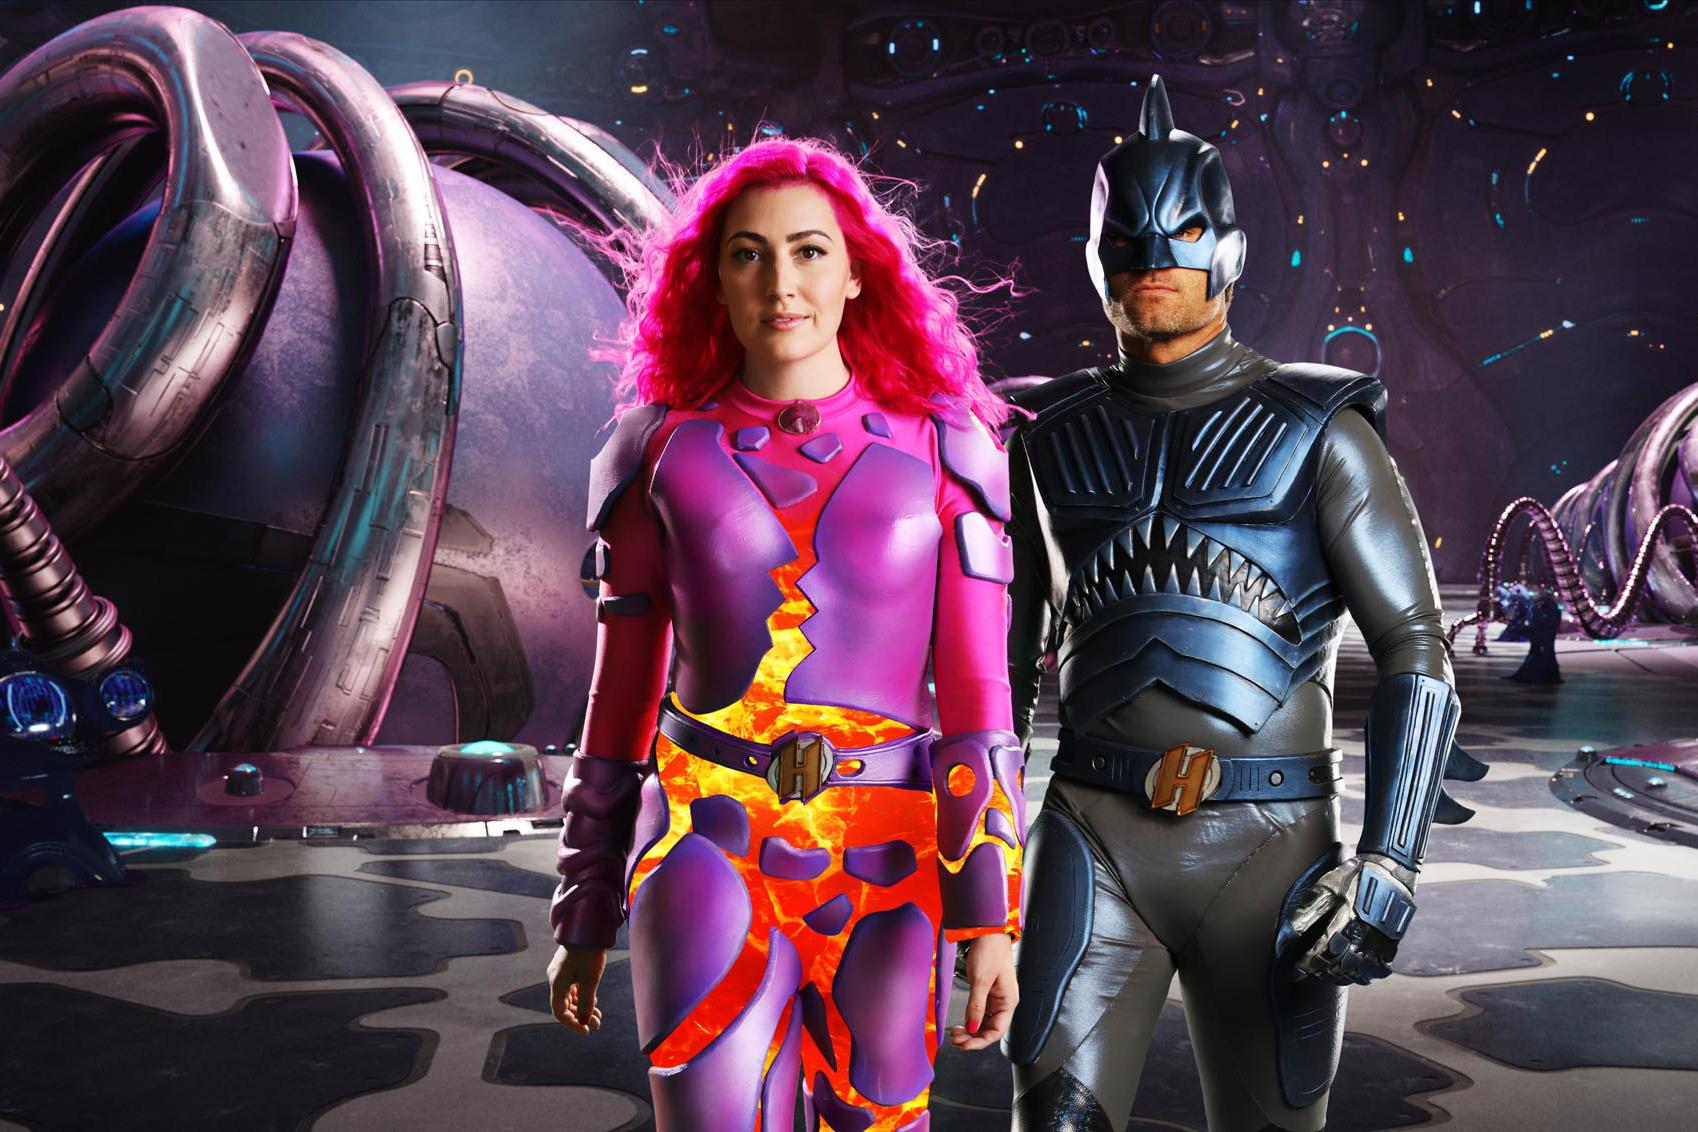 Trailer de We Can Be Heroes mostra um pouco de Sharkboy e Lavagirl; veja!